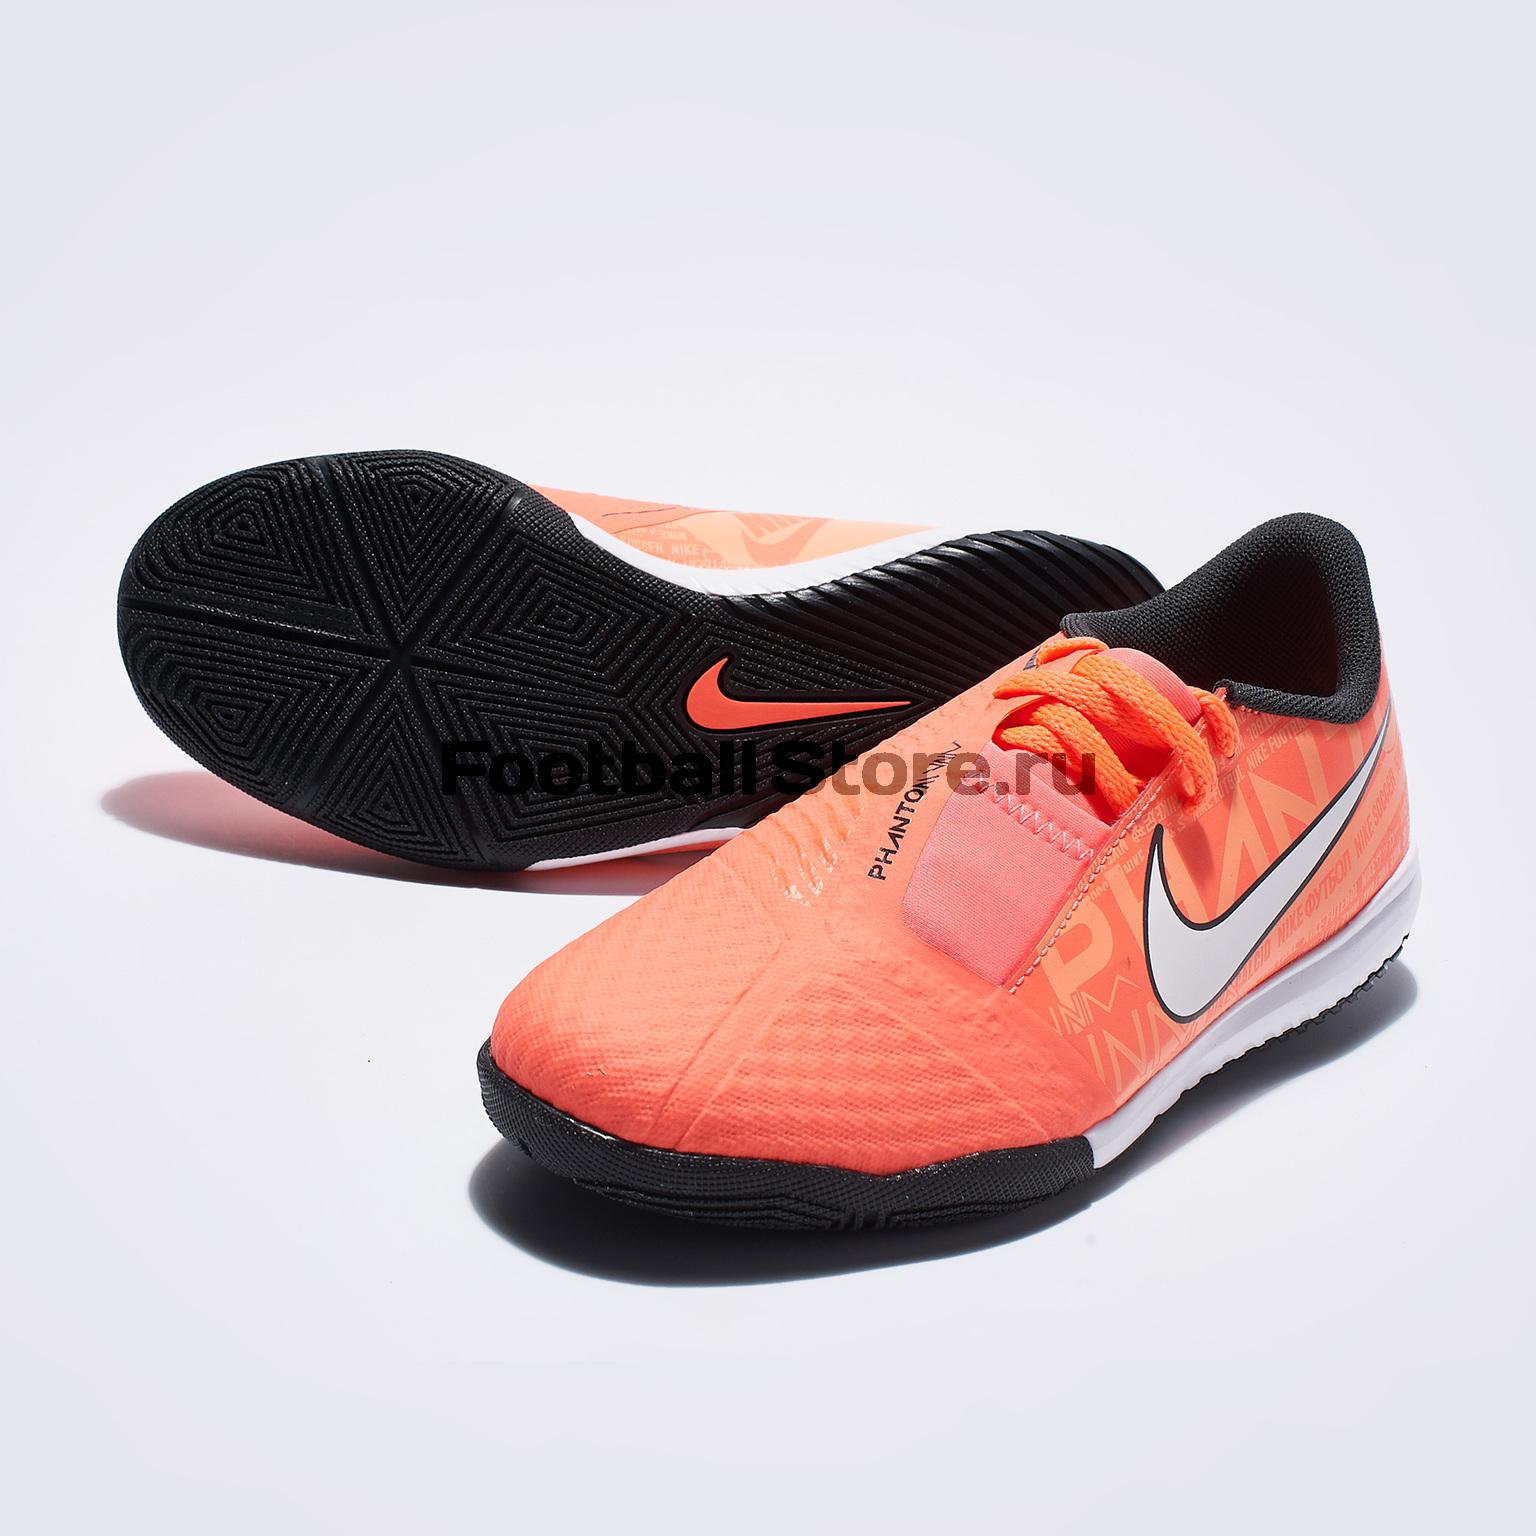 Футзалки детские Nike Phantom Venom Academy IC AO0372-810 810 141 524 018 средняя